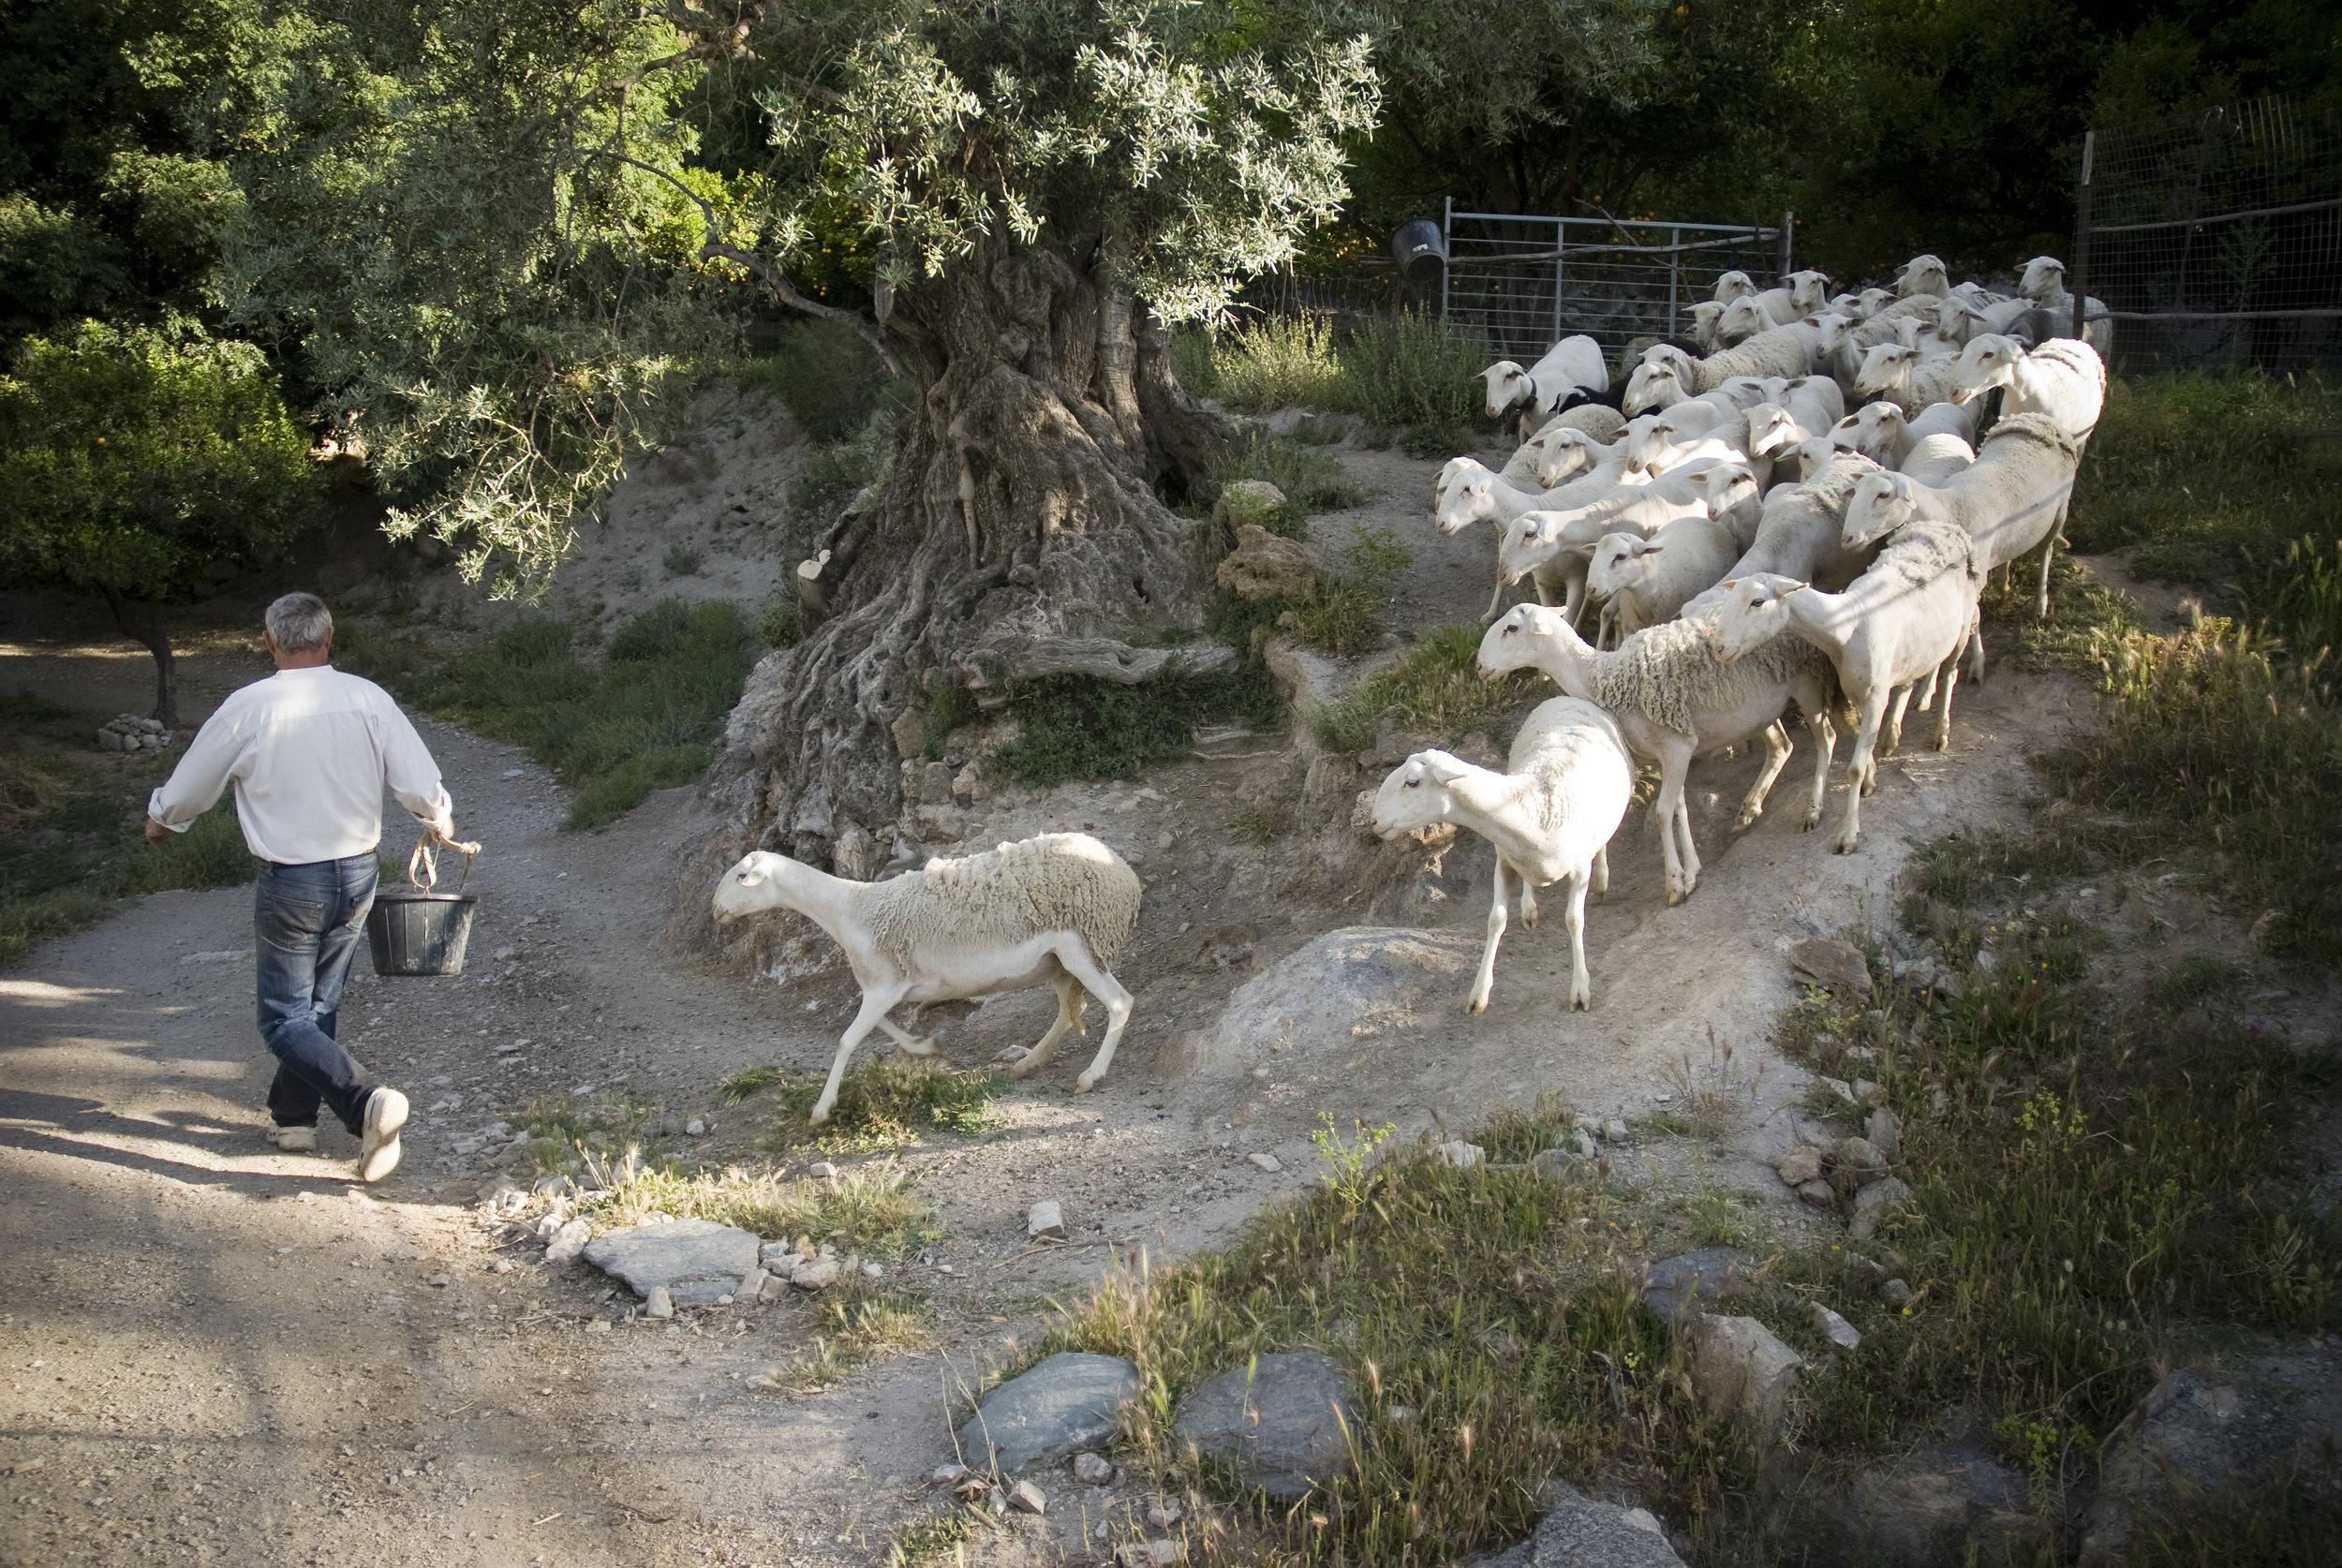 chris pursued by sheep.jpg